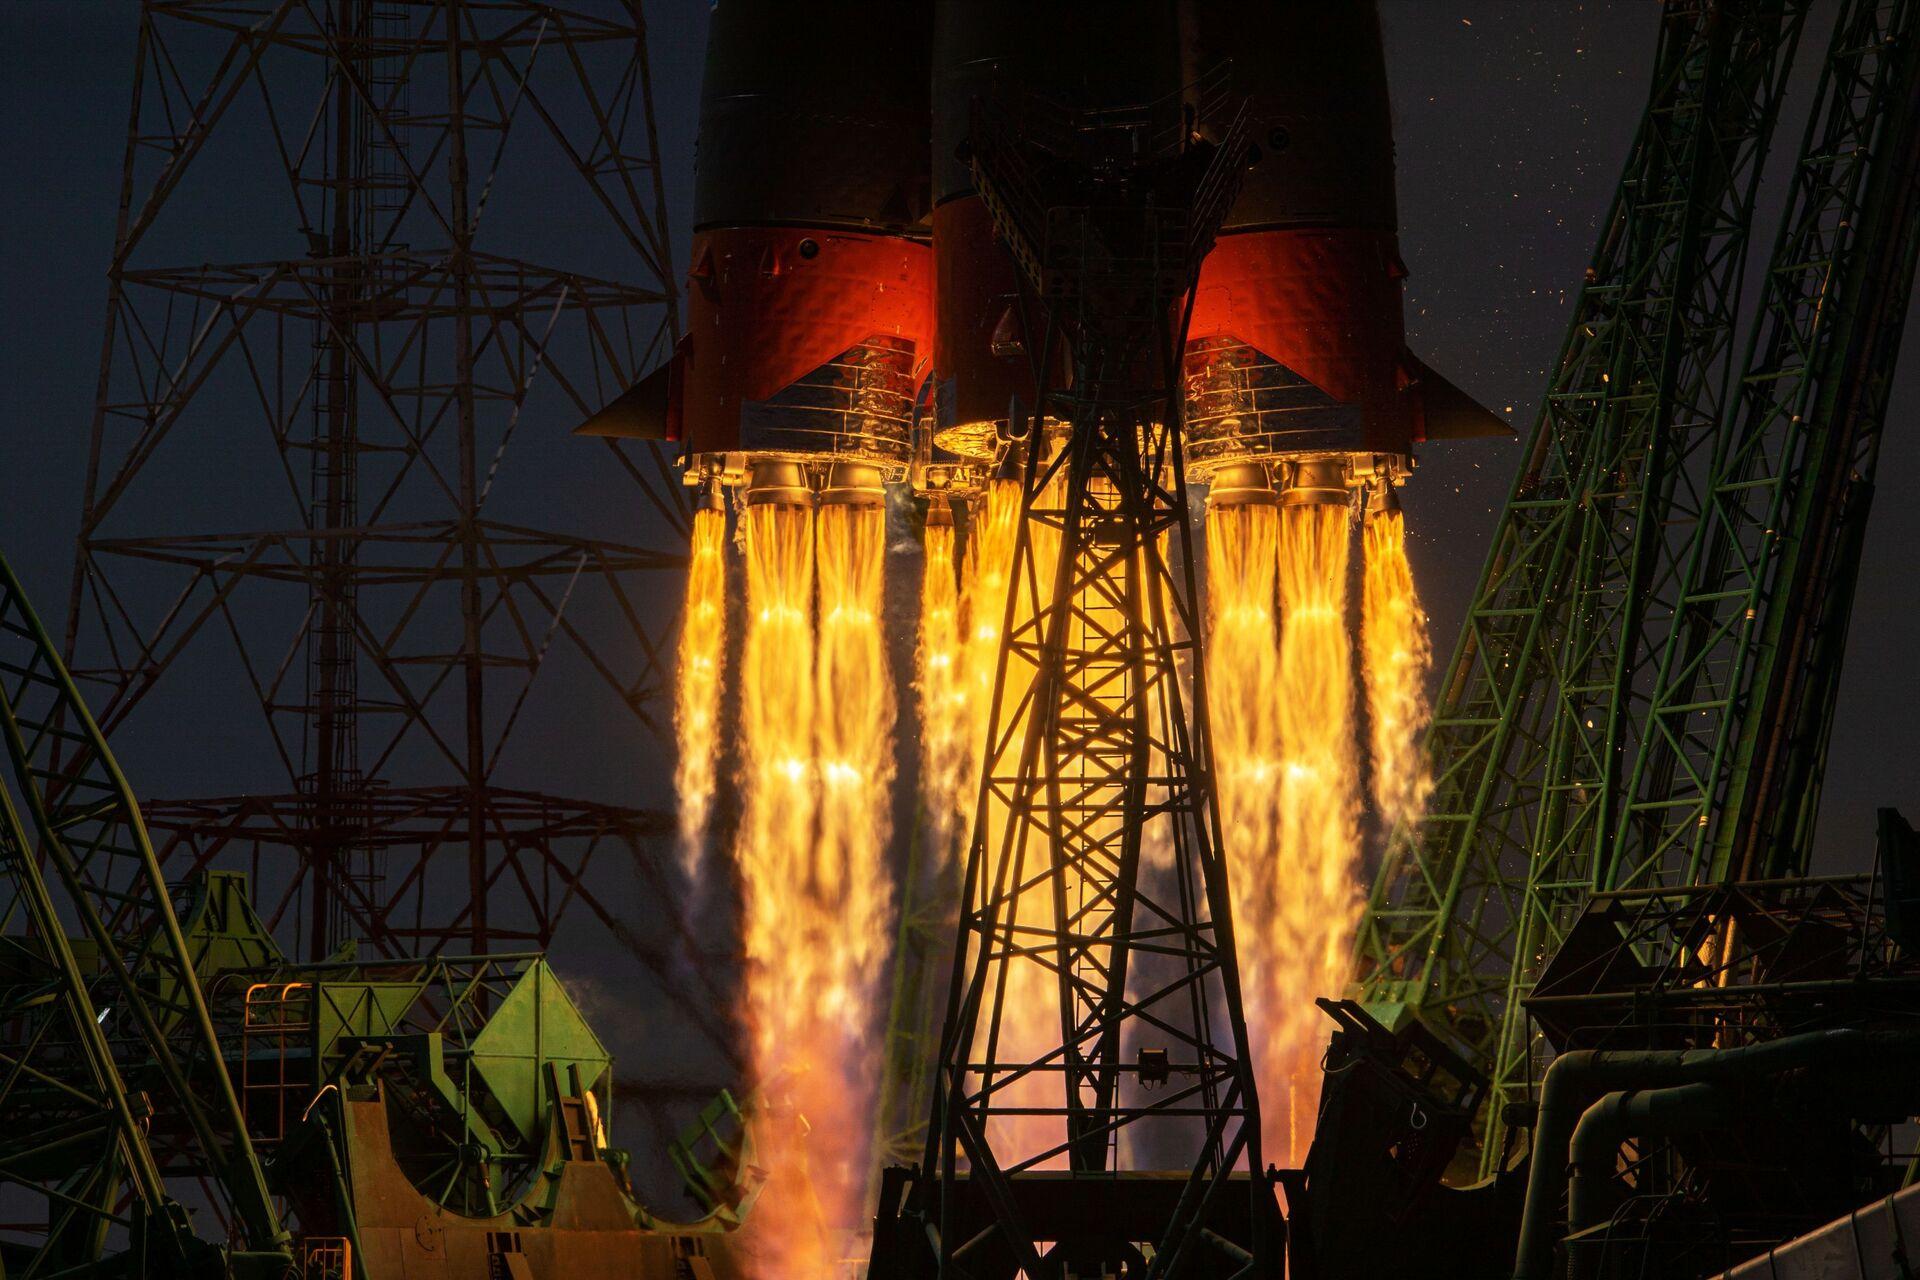 Lancio del razzo Soyuz-2.1 A con la nave spaziale Soyuz MS-18 dal cosmodromo di Baikonur - Sputnik Italia, 1920, 18.05.2021